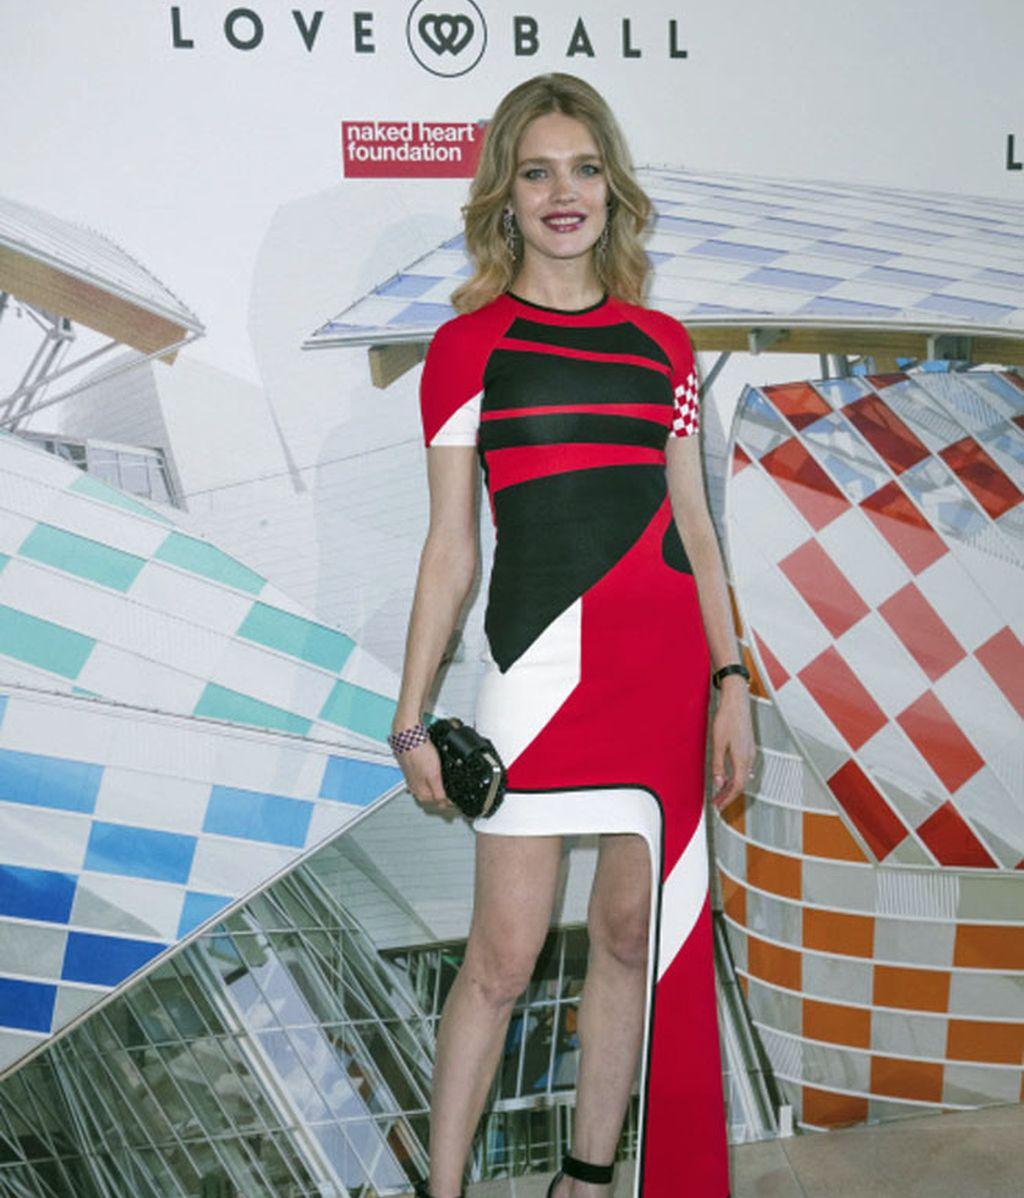 La modelo Natalia Vodianova eligió un vestido de corte asimétrico para la ocasión